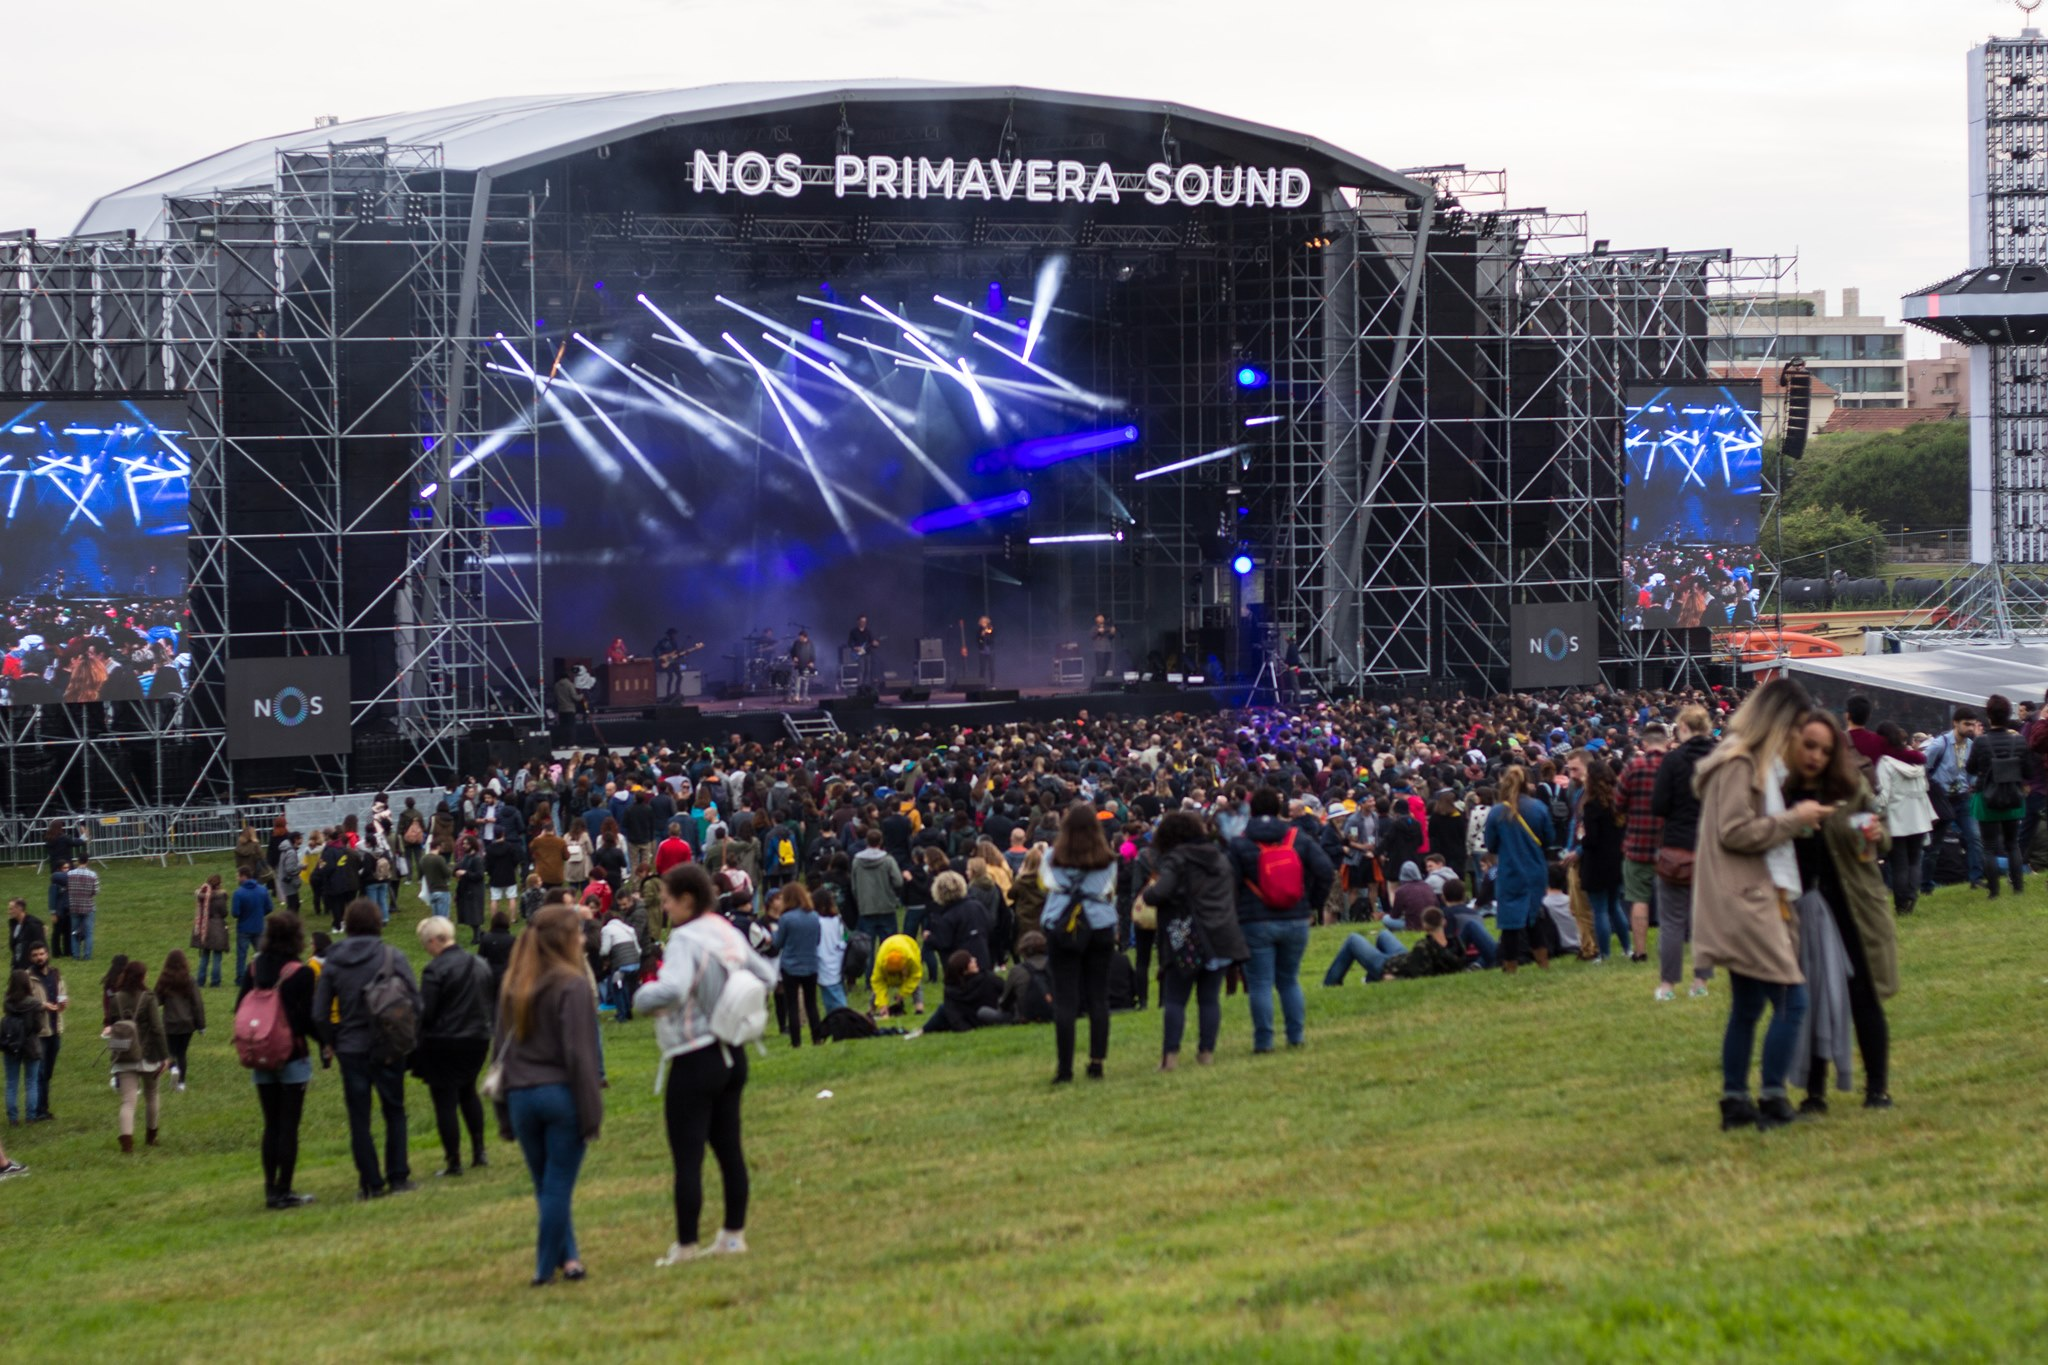 NOS Primavera Sound 2022 Porto